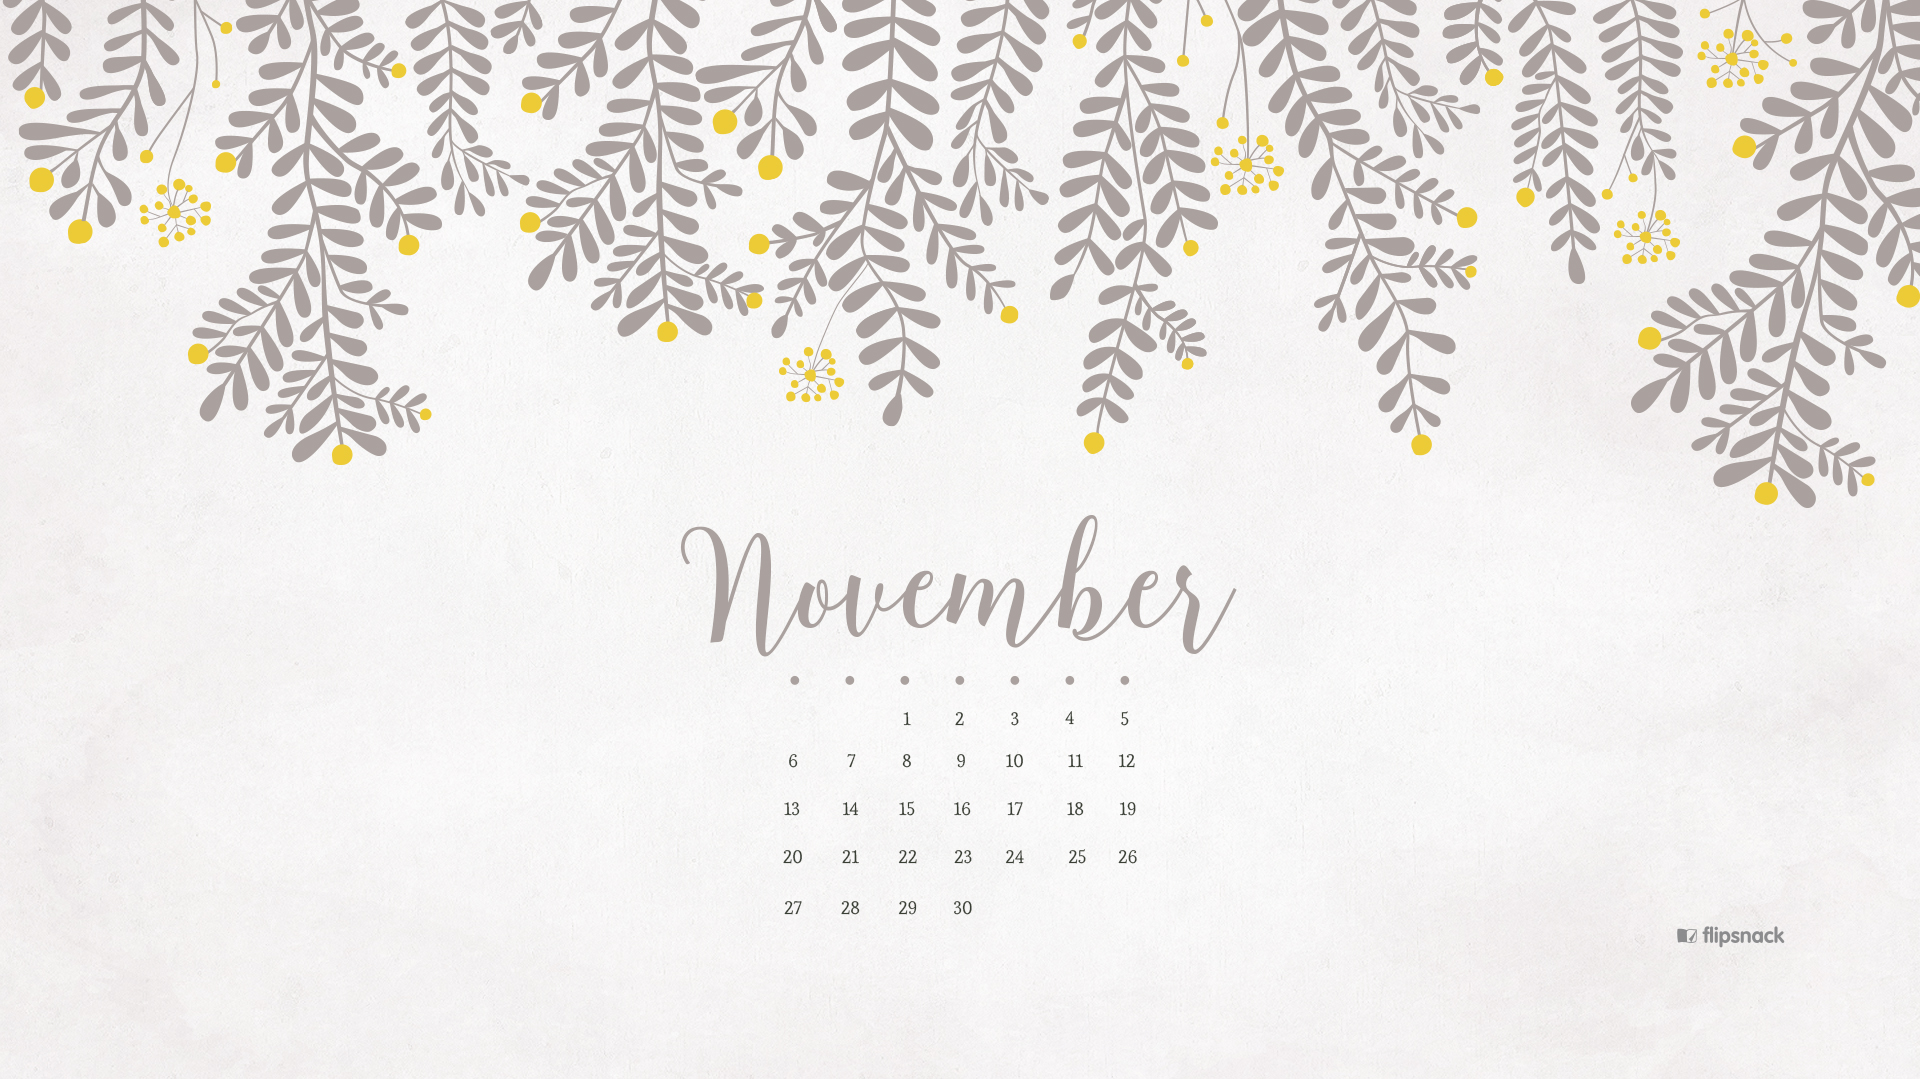 November 2016 free calendar background